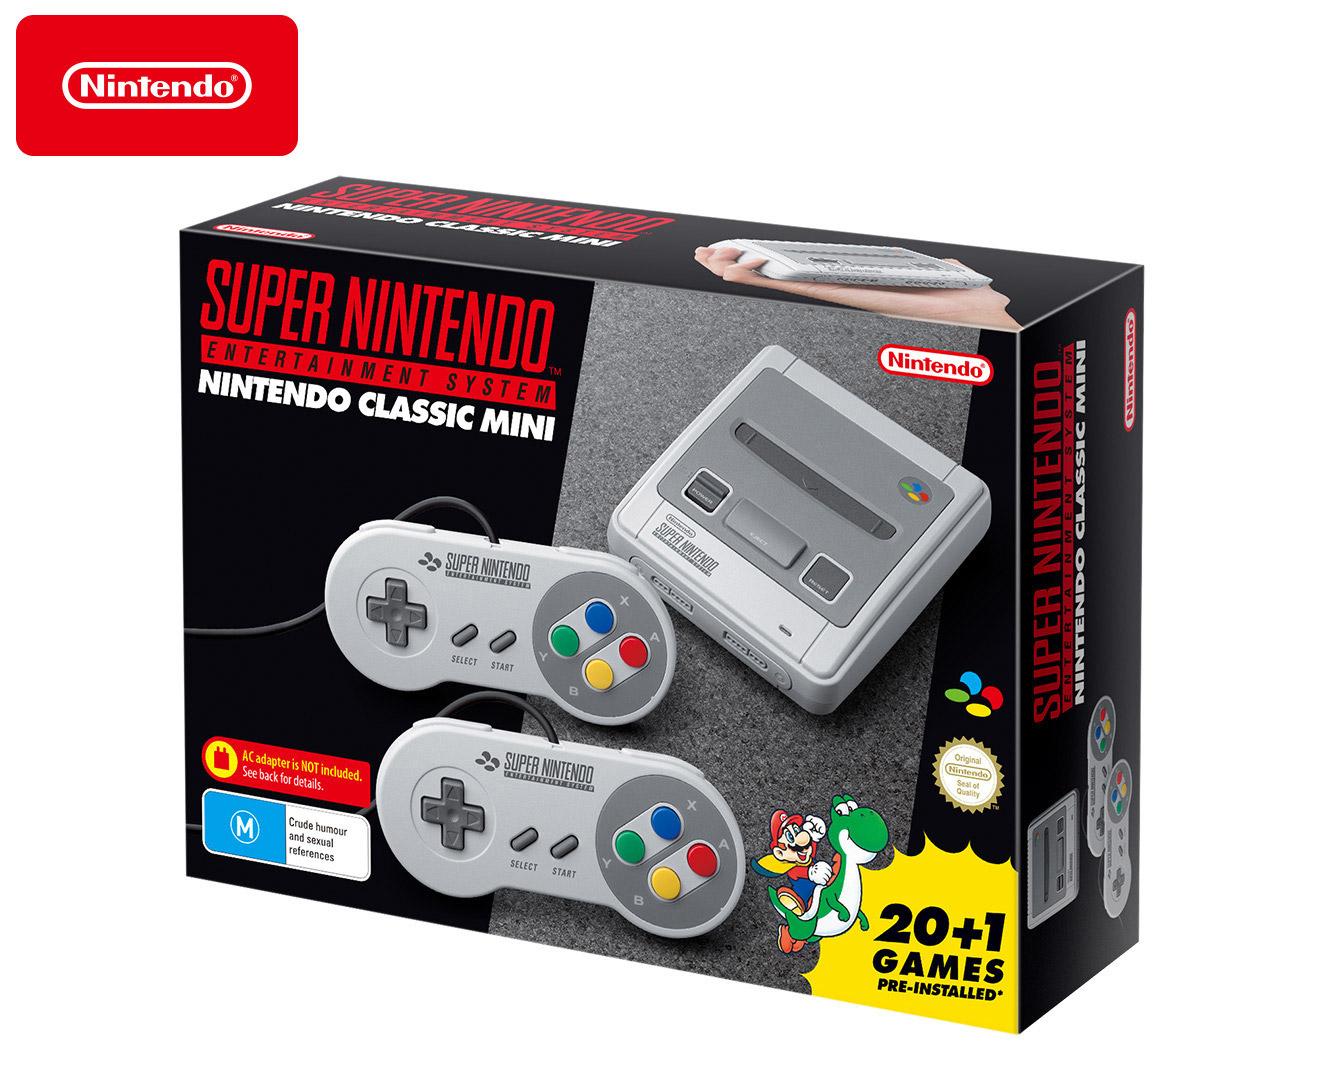 c35b526f74960 Nintendo Classic Mini SNES  Super Nintendo Entertainment System + 21 Super  NES Pre-Installed Games